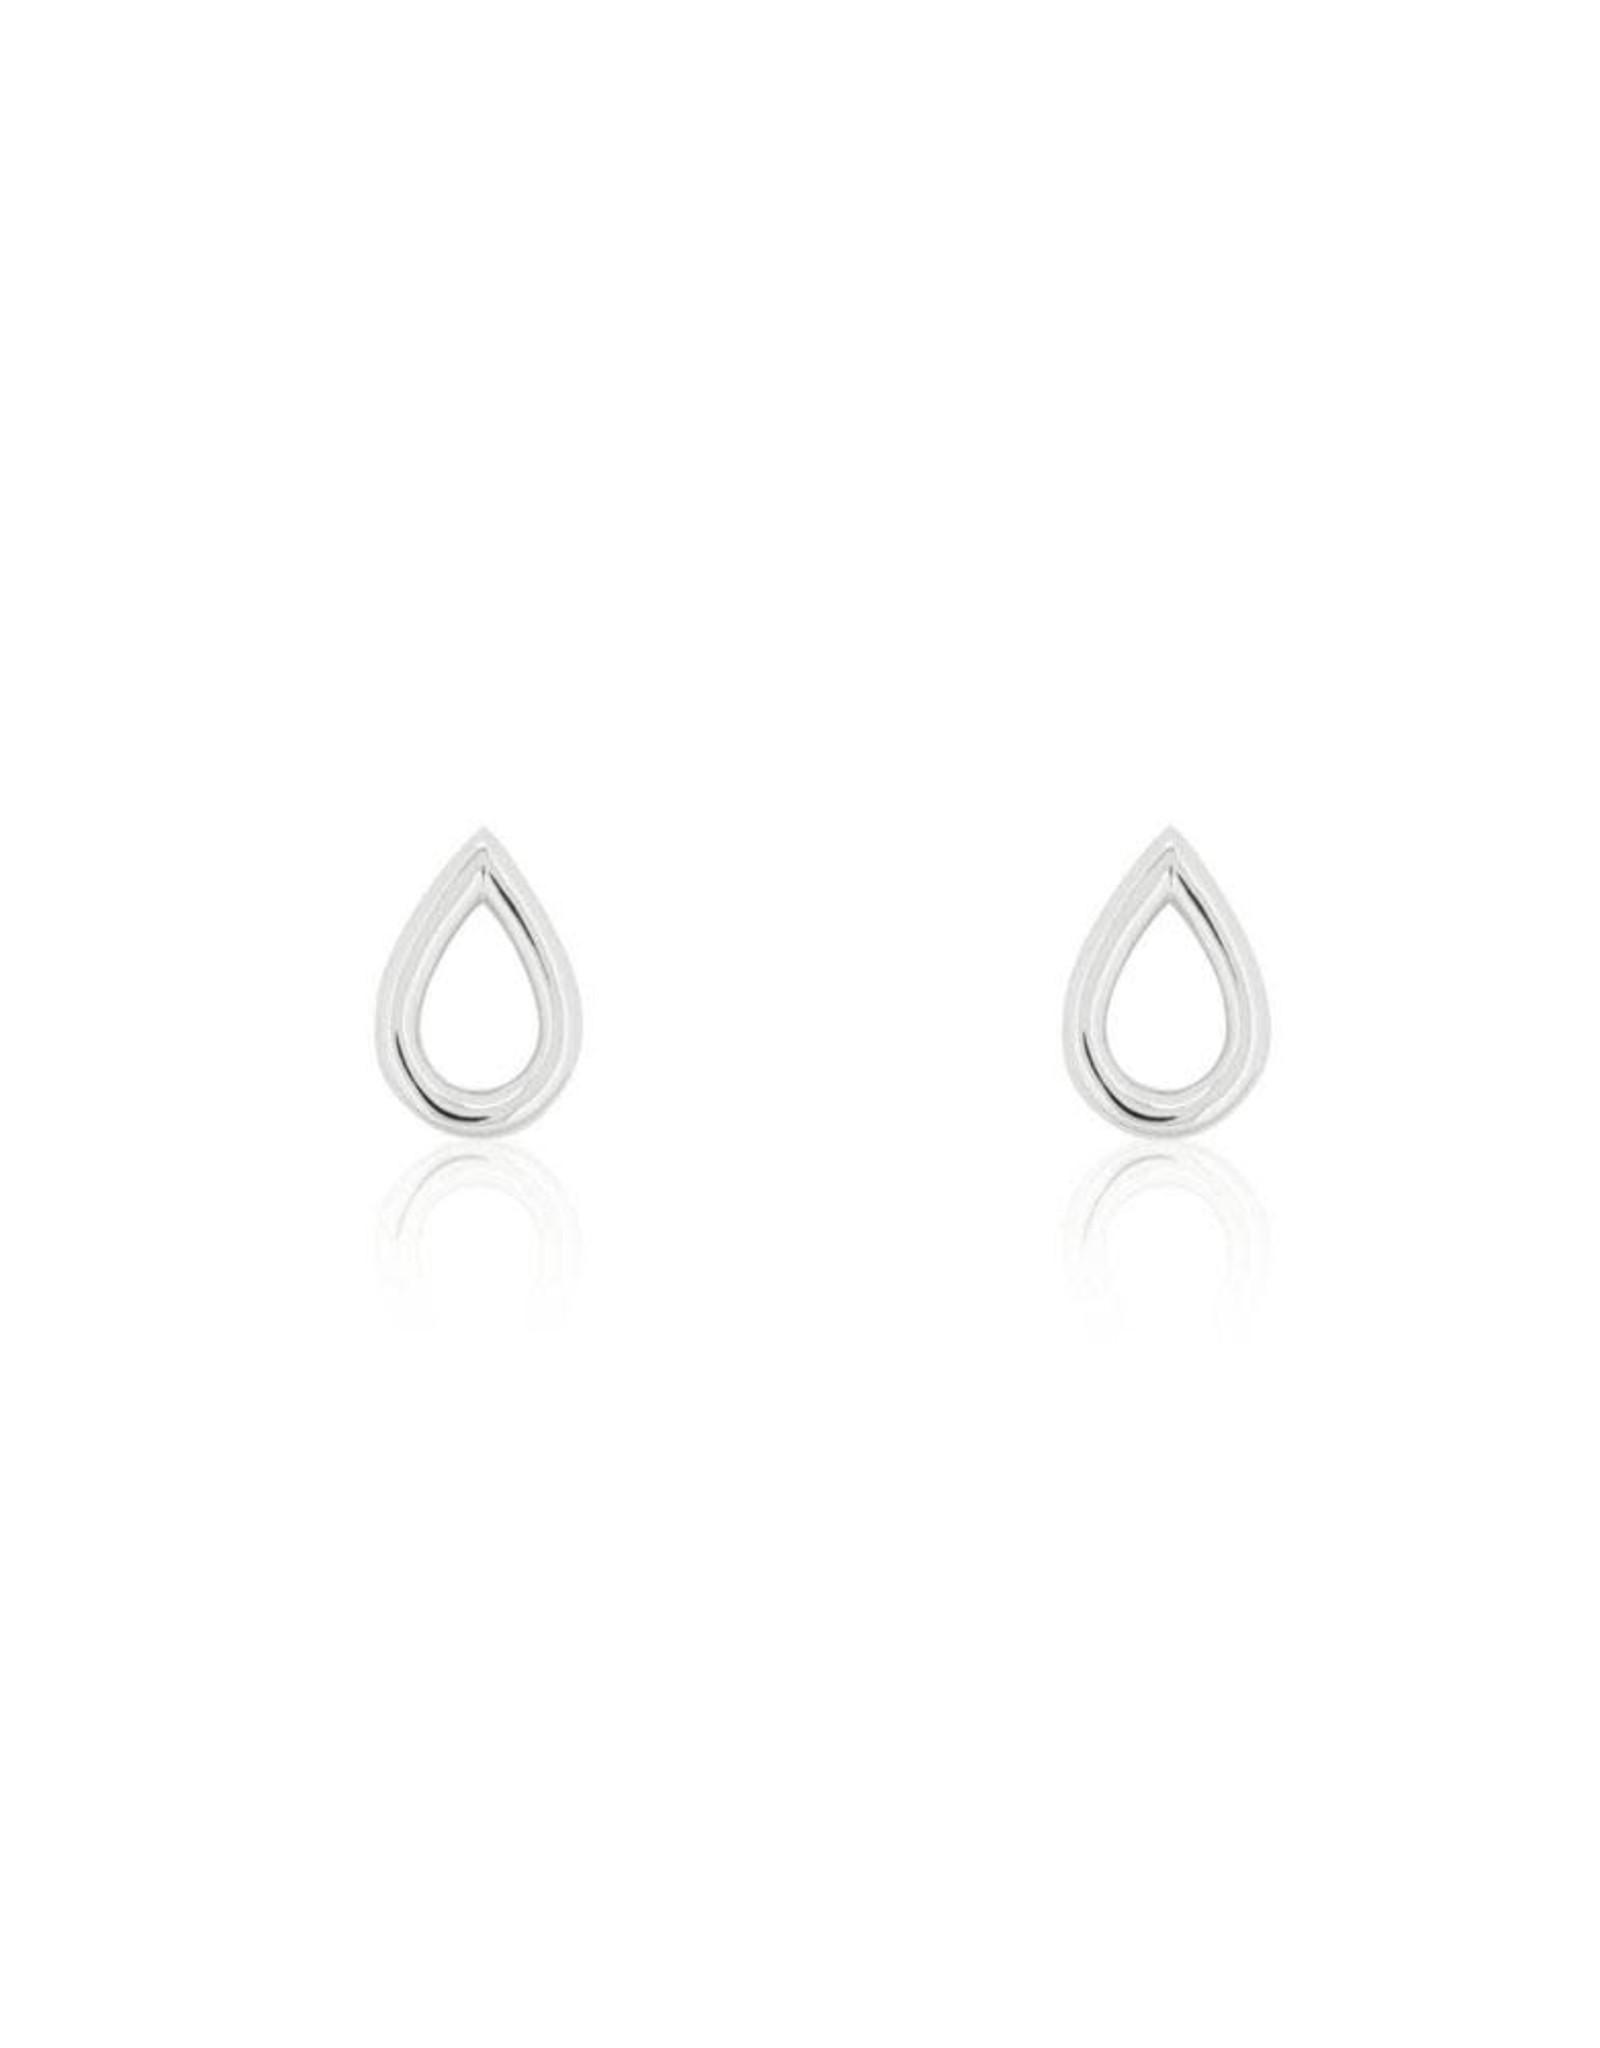 Linda Tahija Open Drop Stud Earrings, Silver